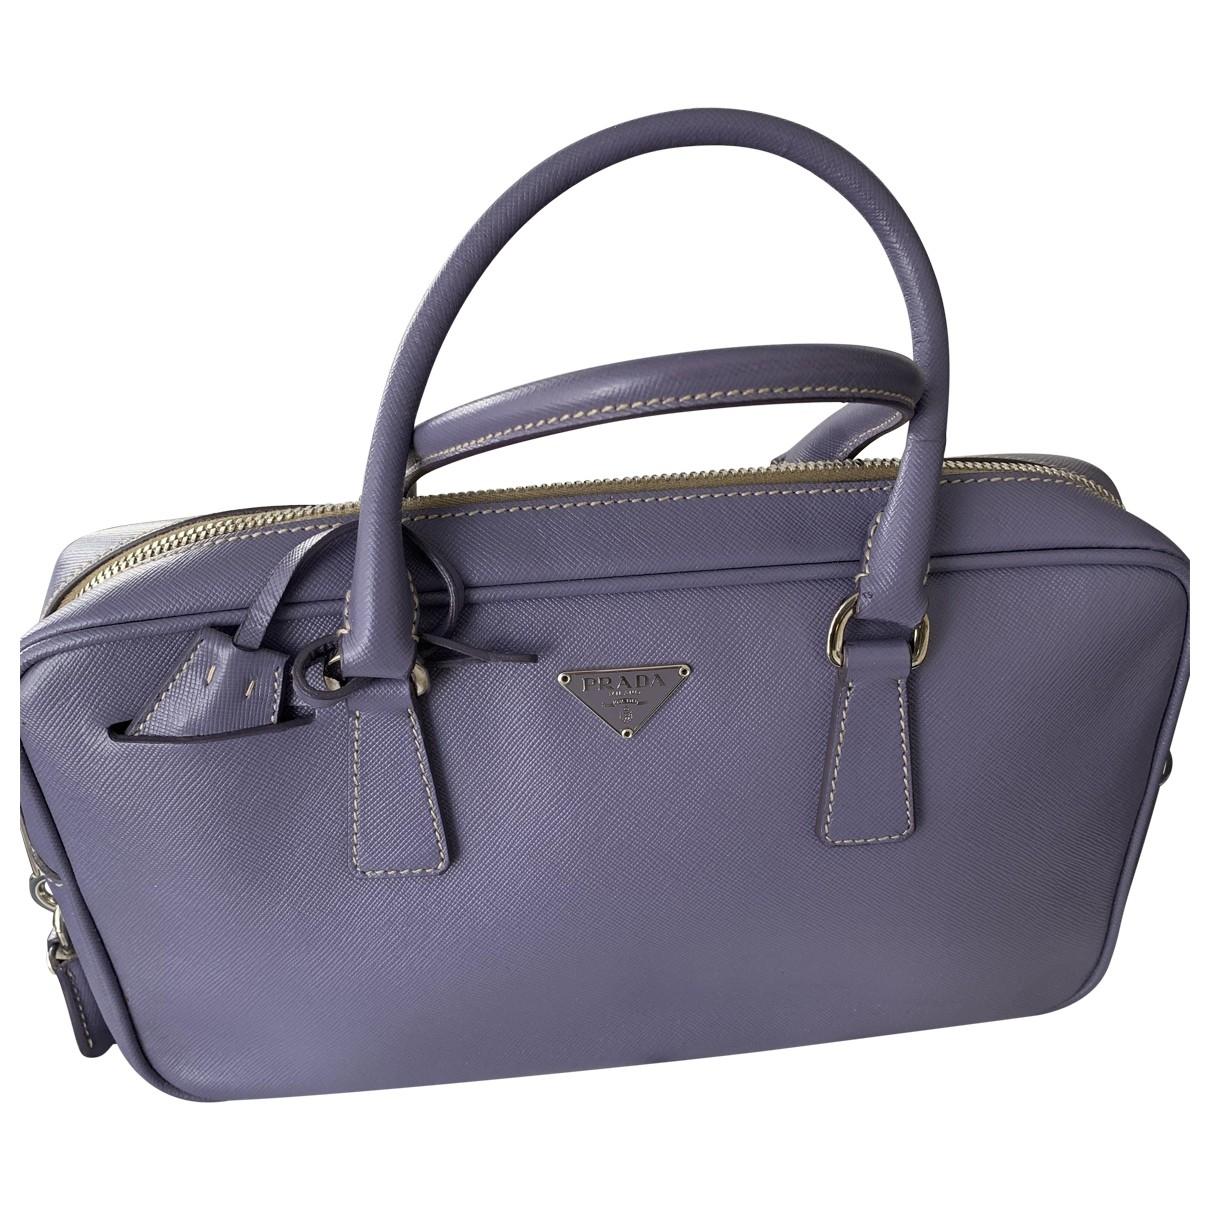 Prada - Sac a main   pour femme en cuir - violet